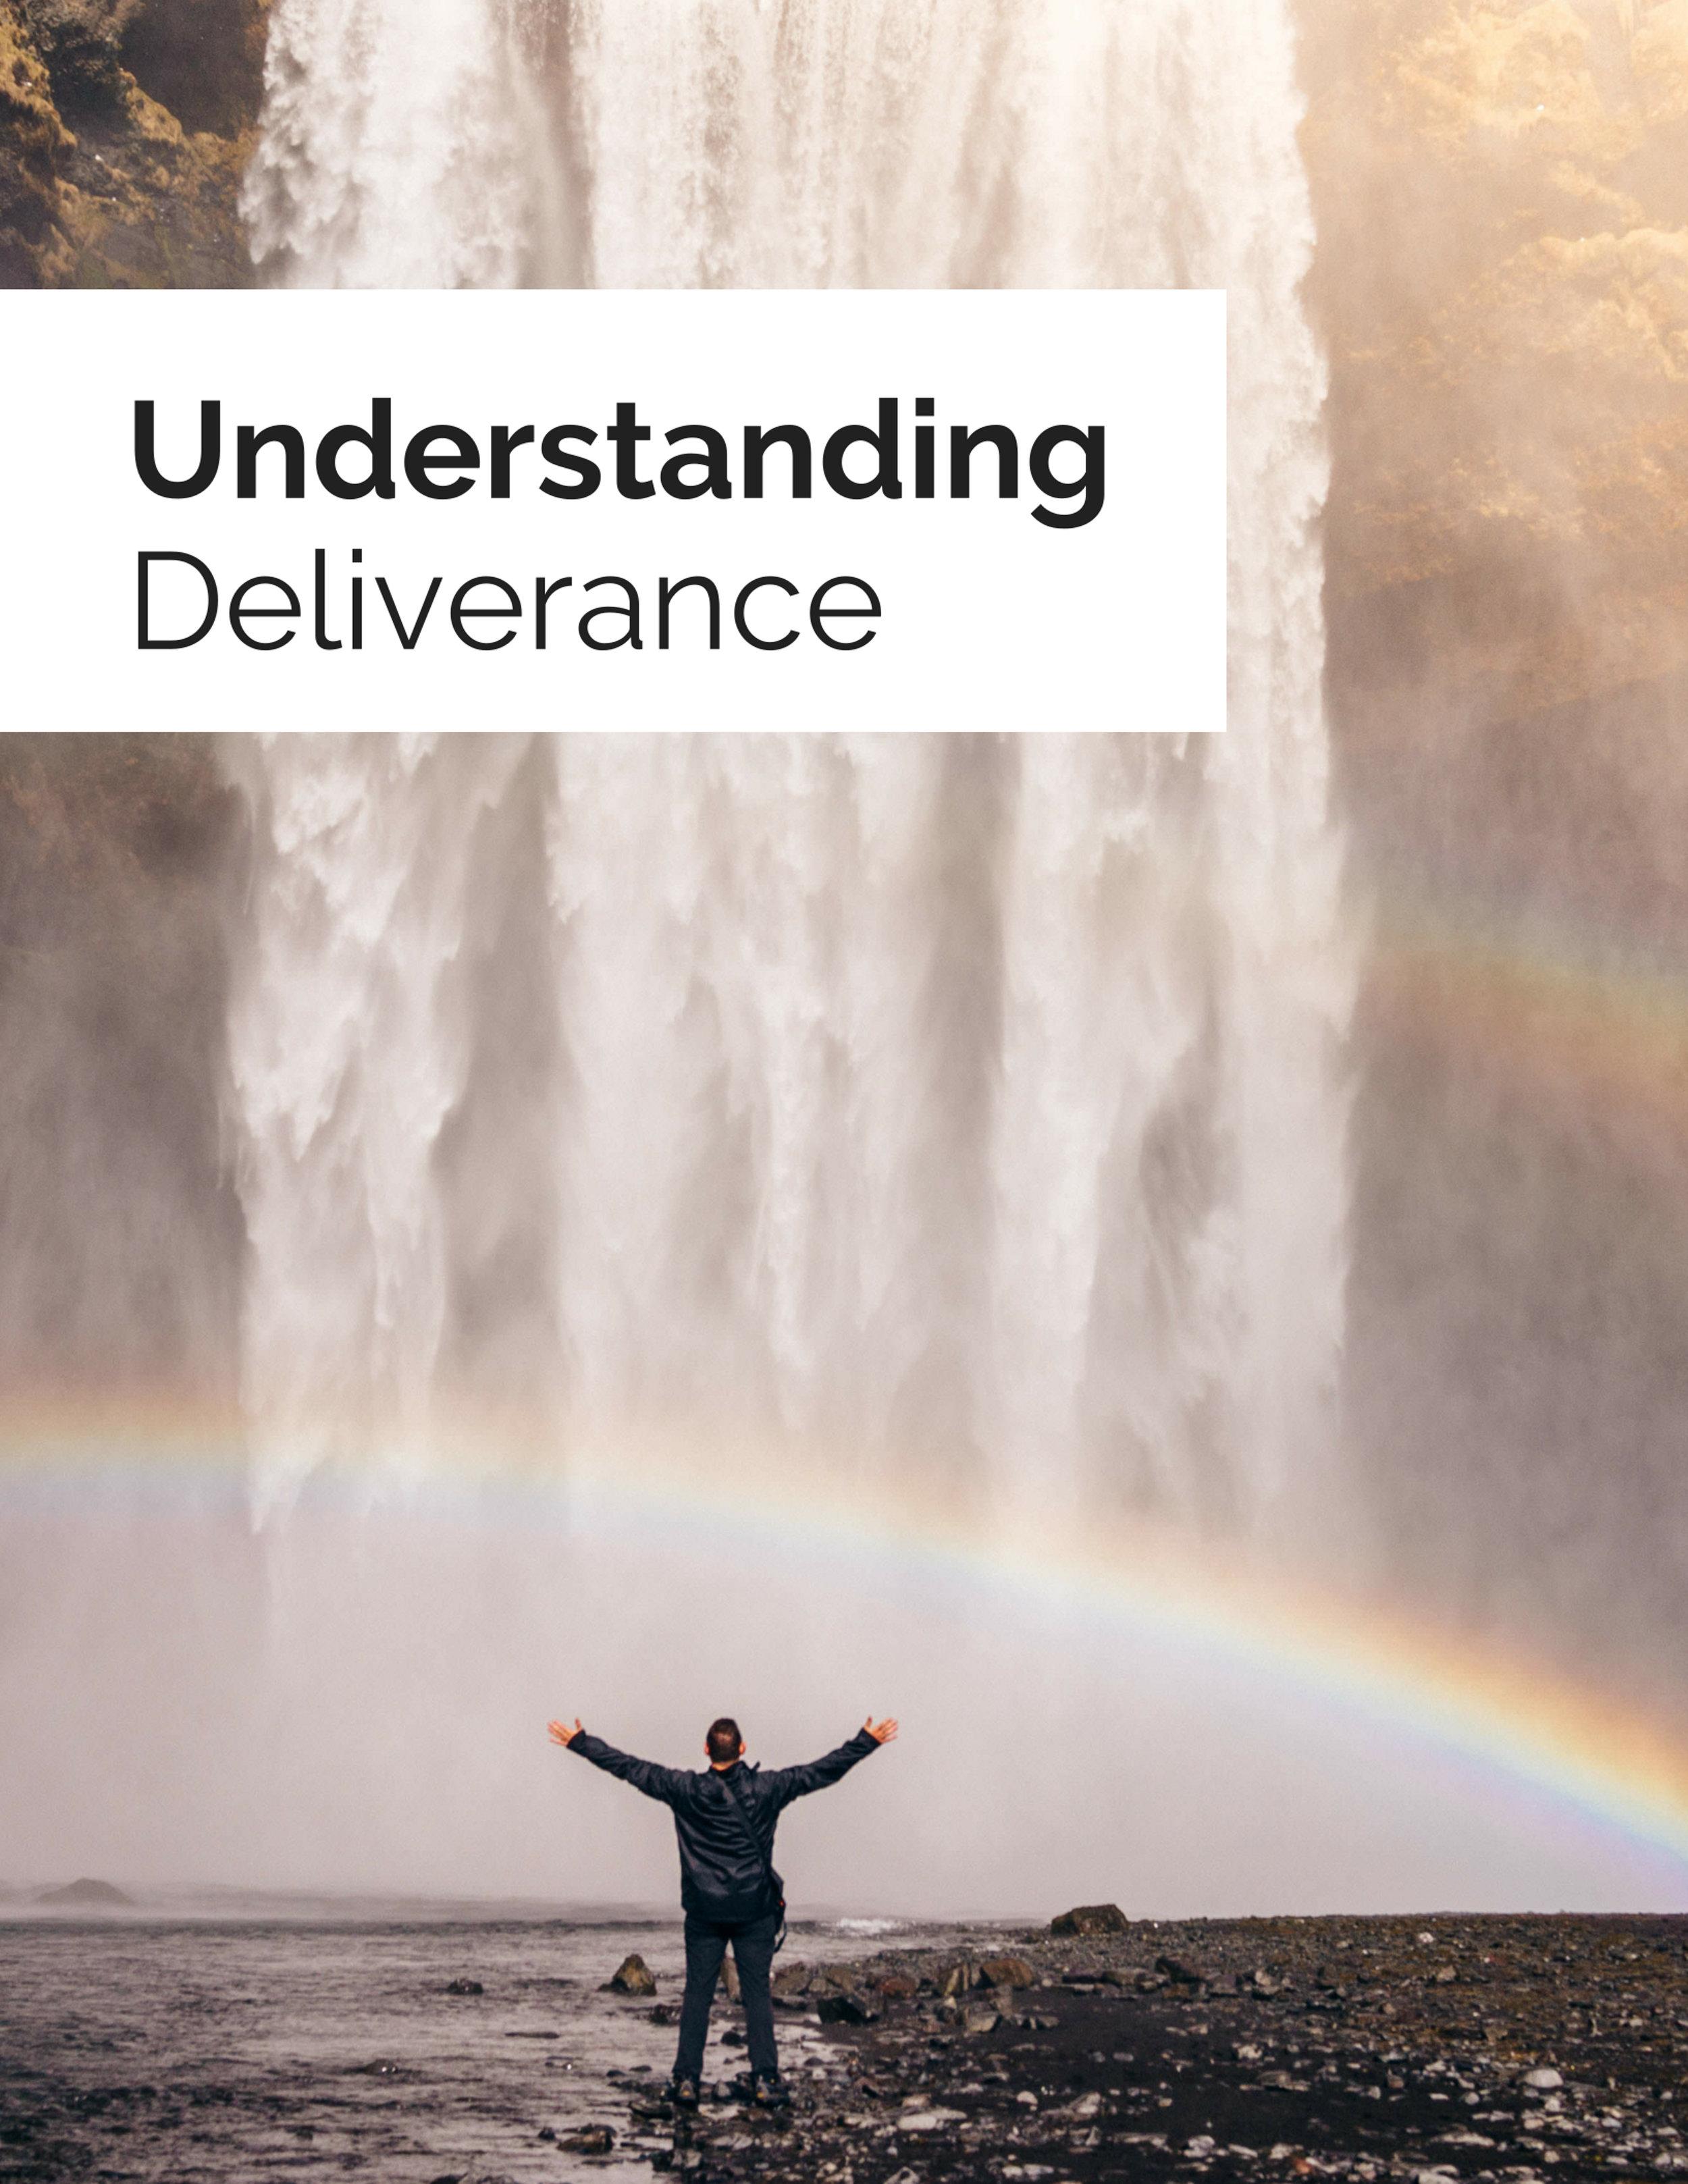 UnderstandingDeliverance.jpg